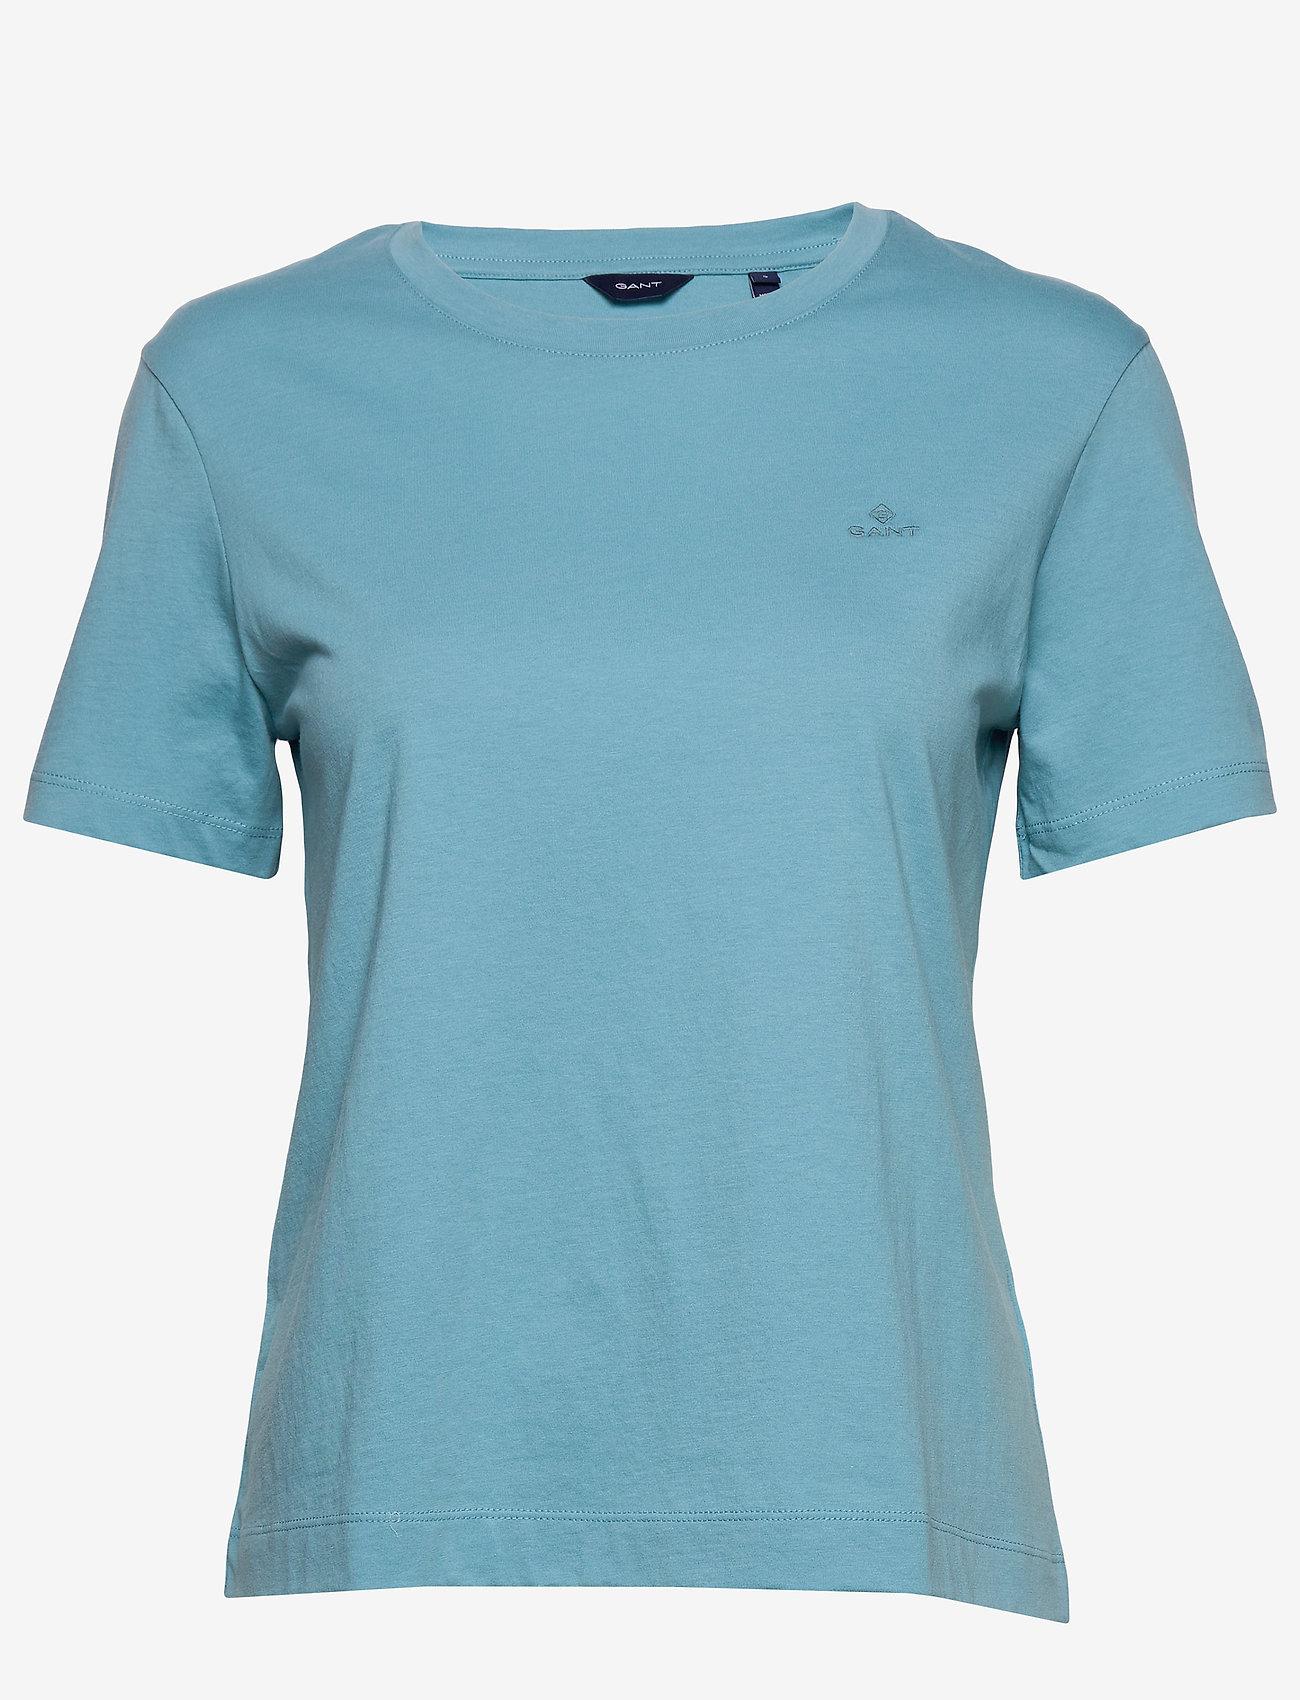 GANT - ORIGINAL SS T-SHIRT - basic t-shirts - seafoam blue - 0